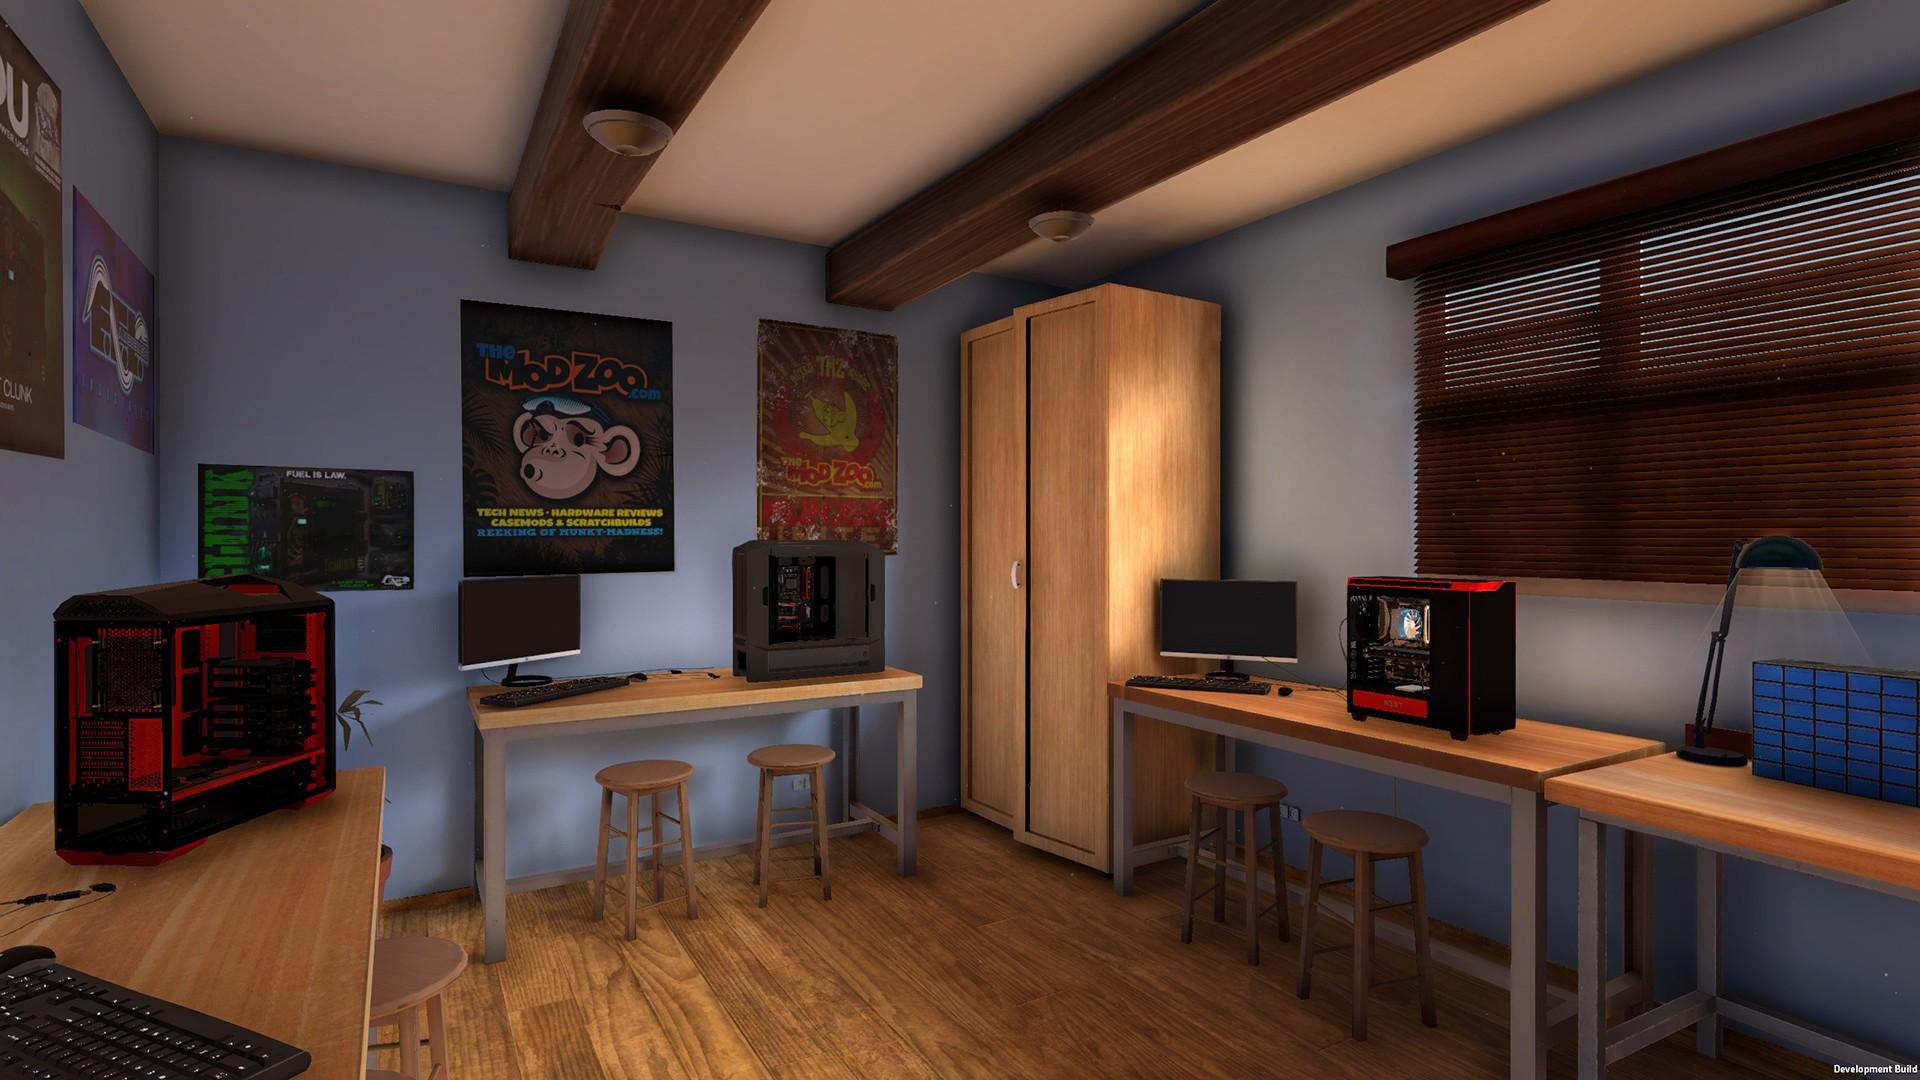 Acquista pc building simulator steam for Room decoration simulator free